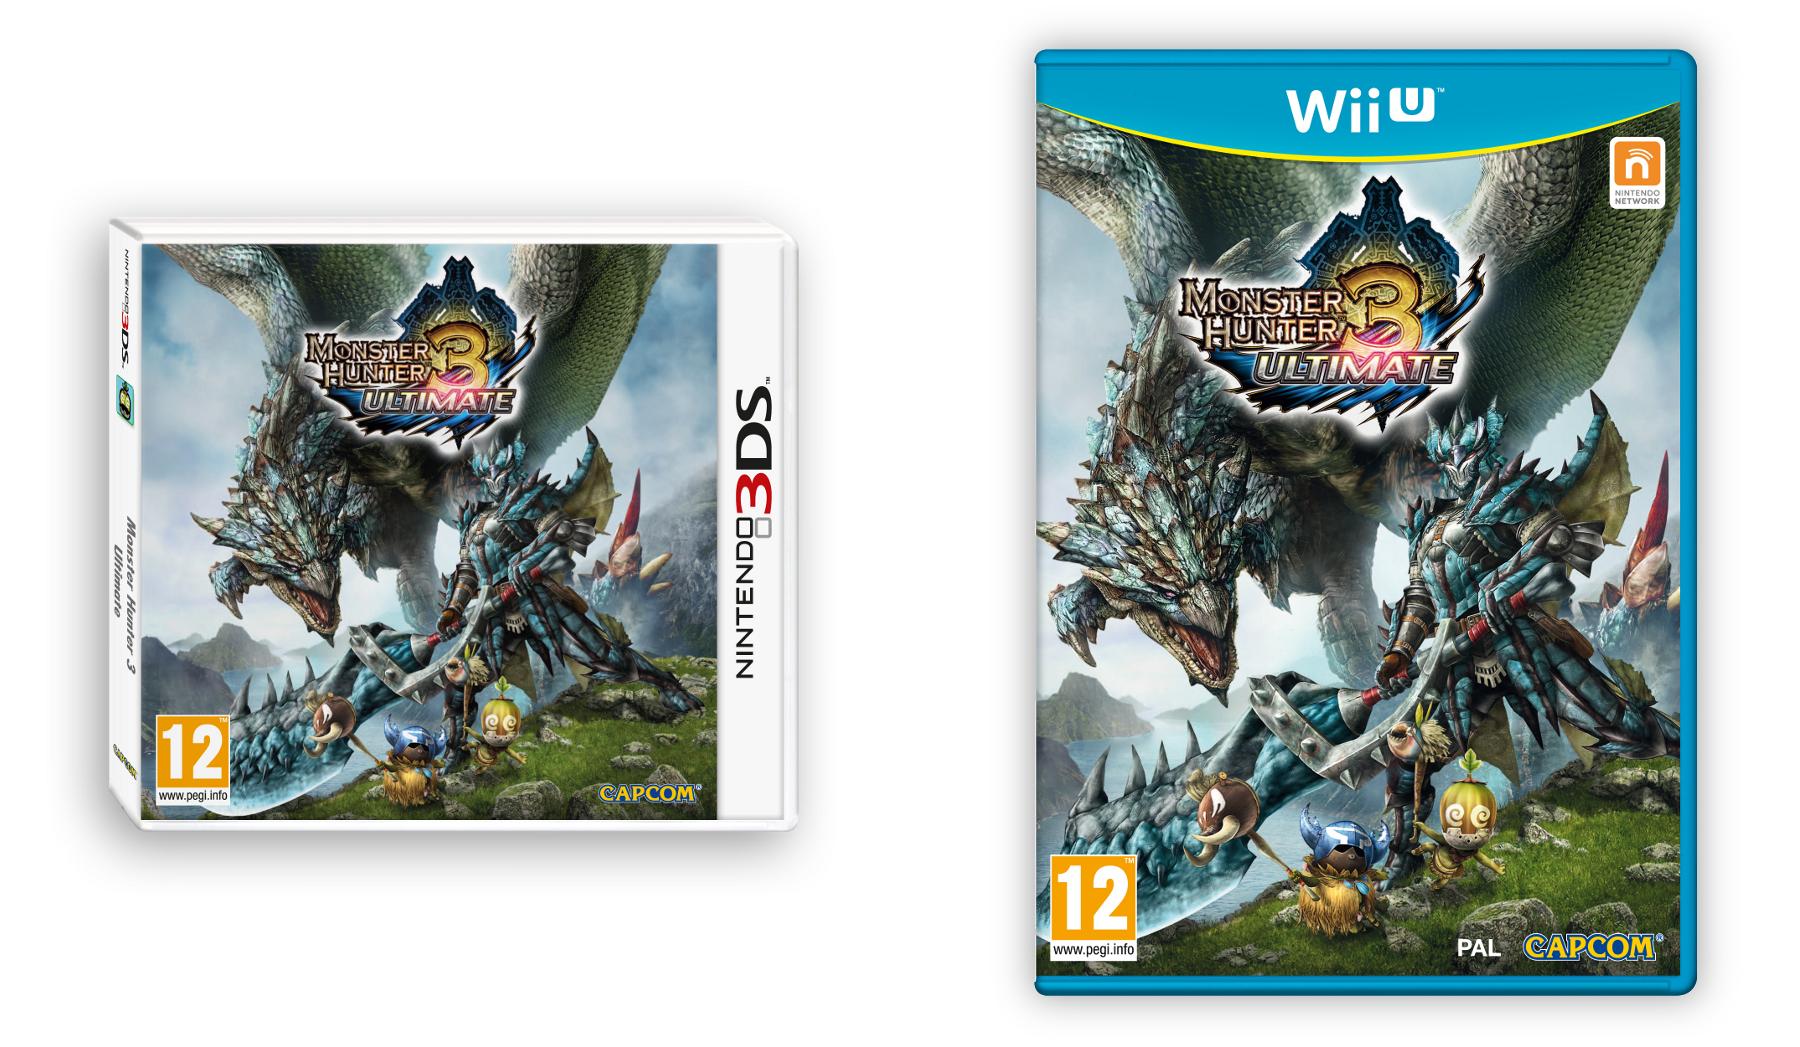 Monster-Hunter-3-Ultimate-3DS-Wii-U-Boxart